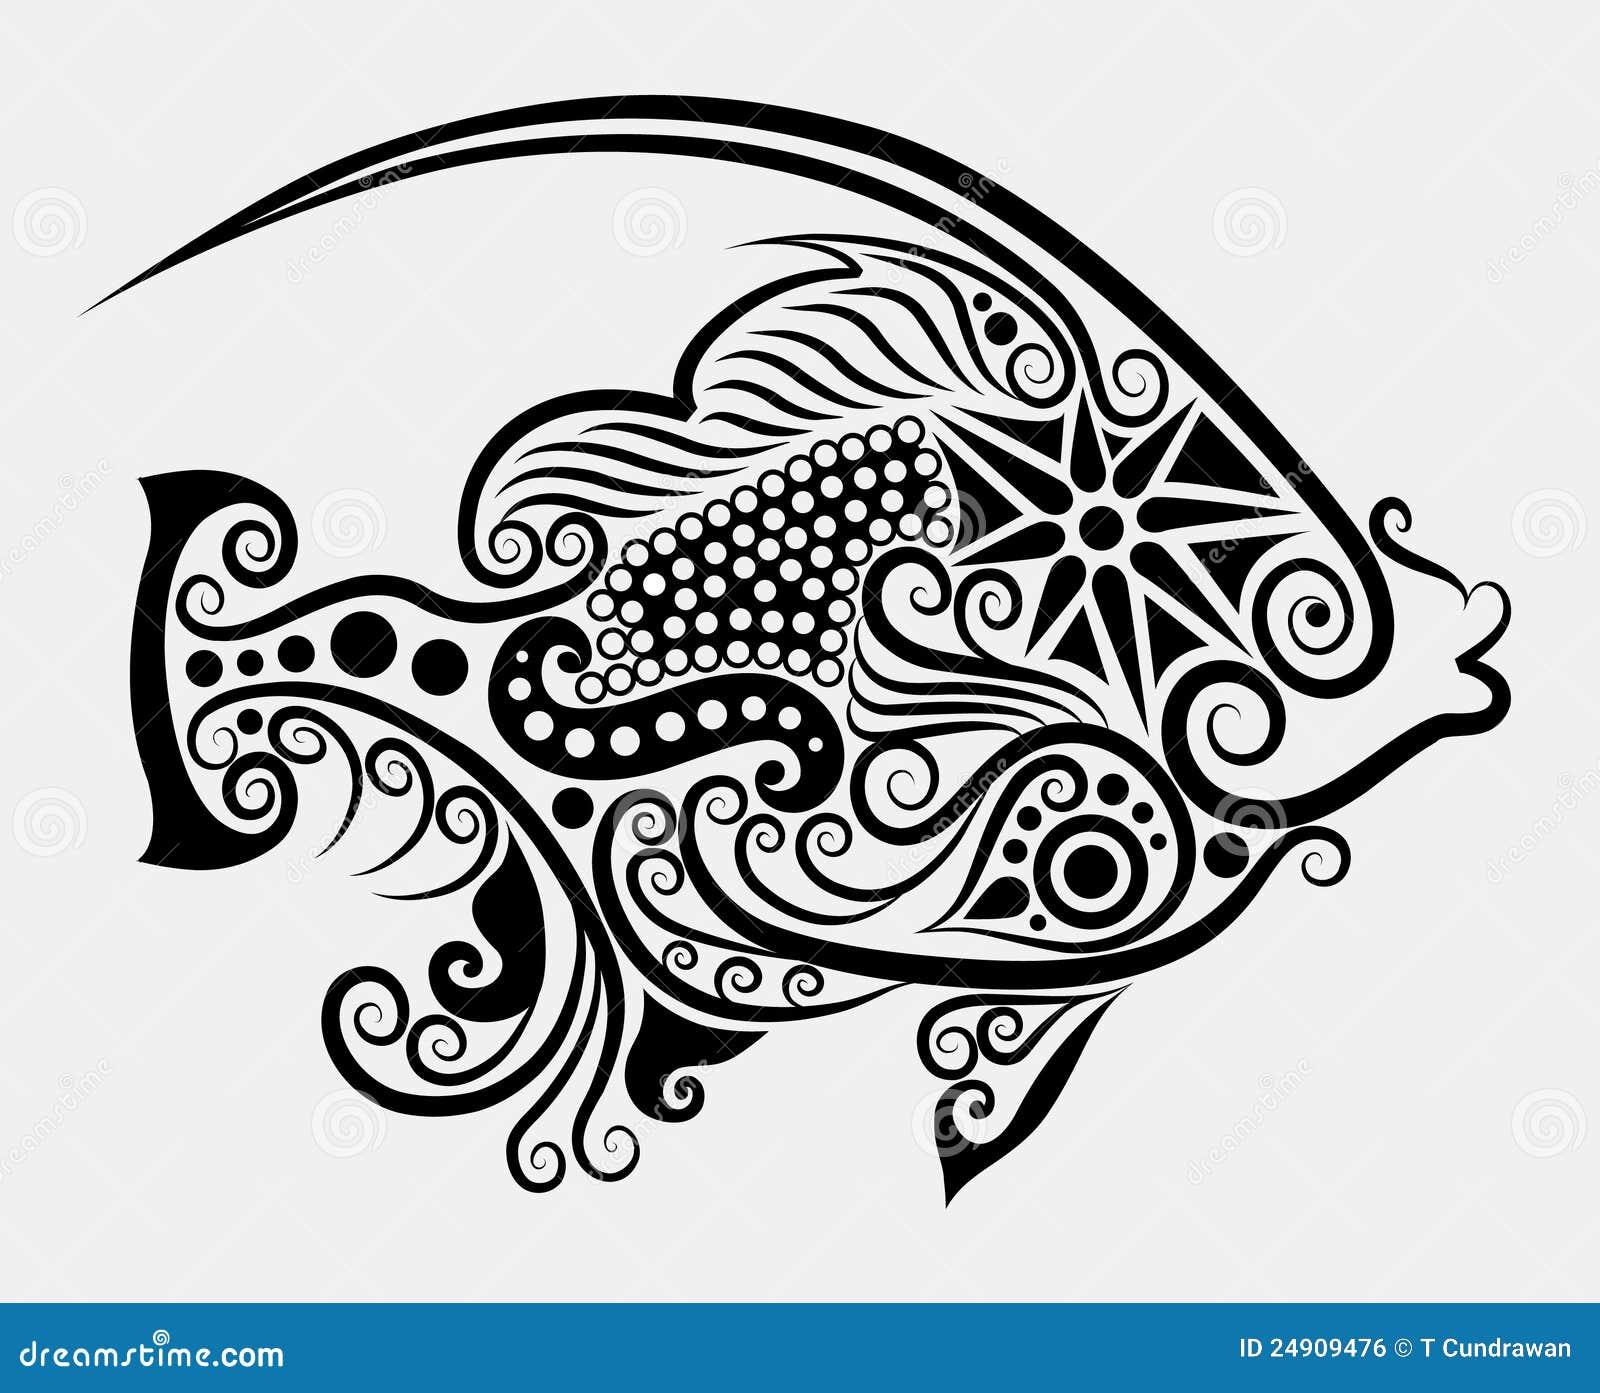 Fish Decorative #2 Royalty Free Stock Image - Image: 24909476